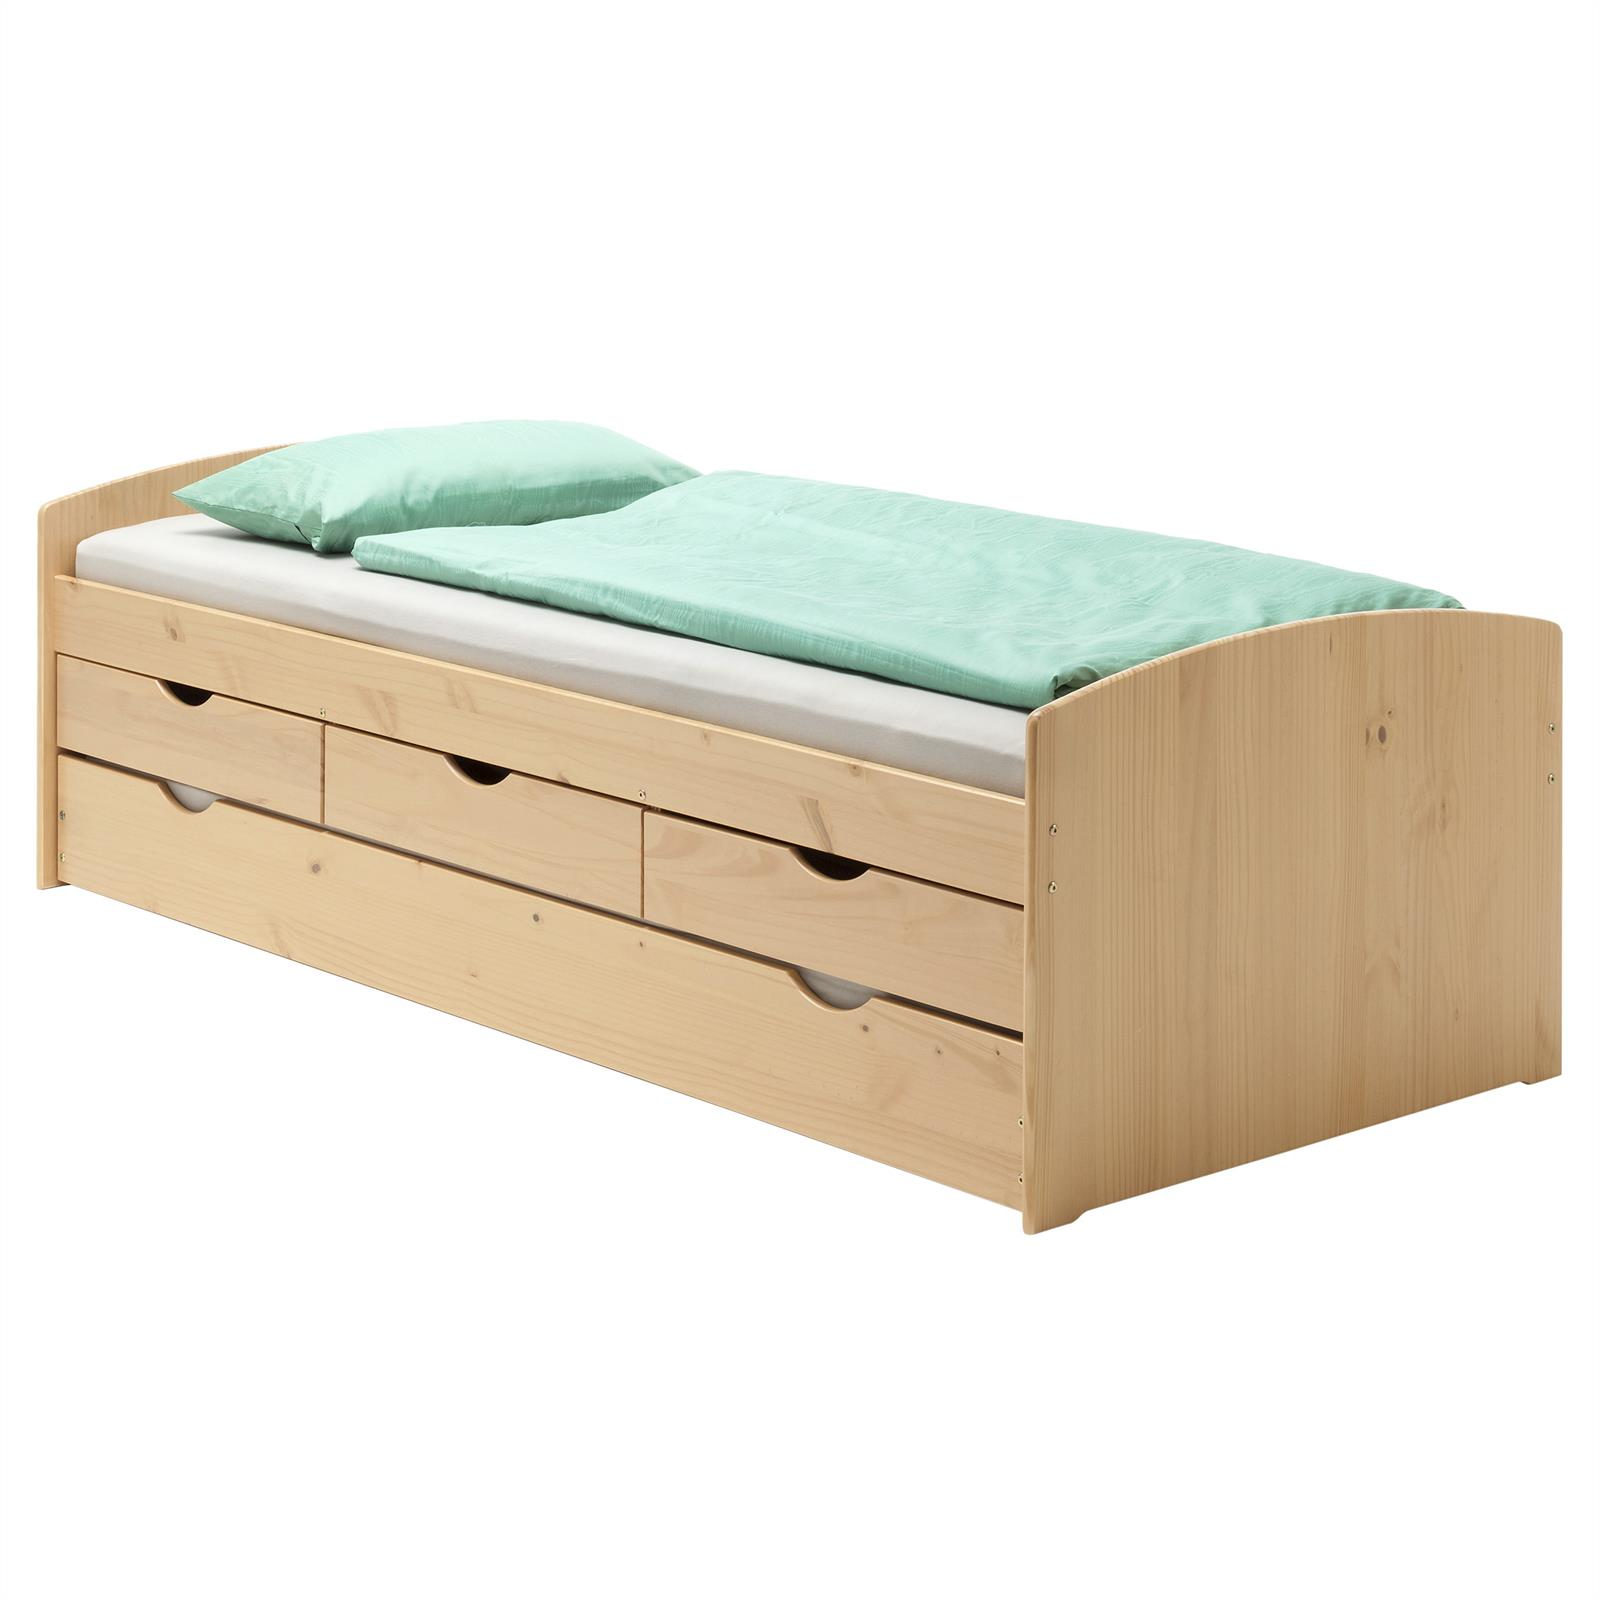 jugendbett funktionsbett g ste einzel auszugs auszieh. Black Bedroom Furniture Sets. Home Design Ideas